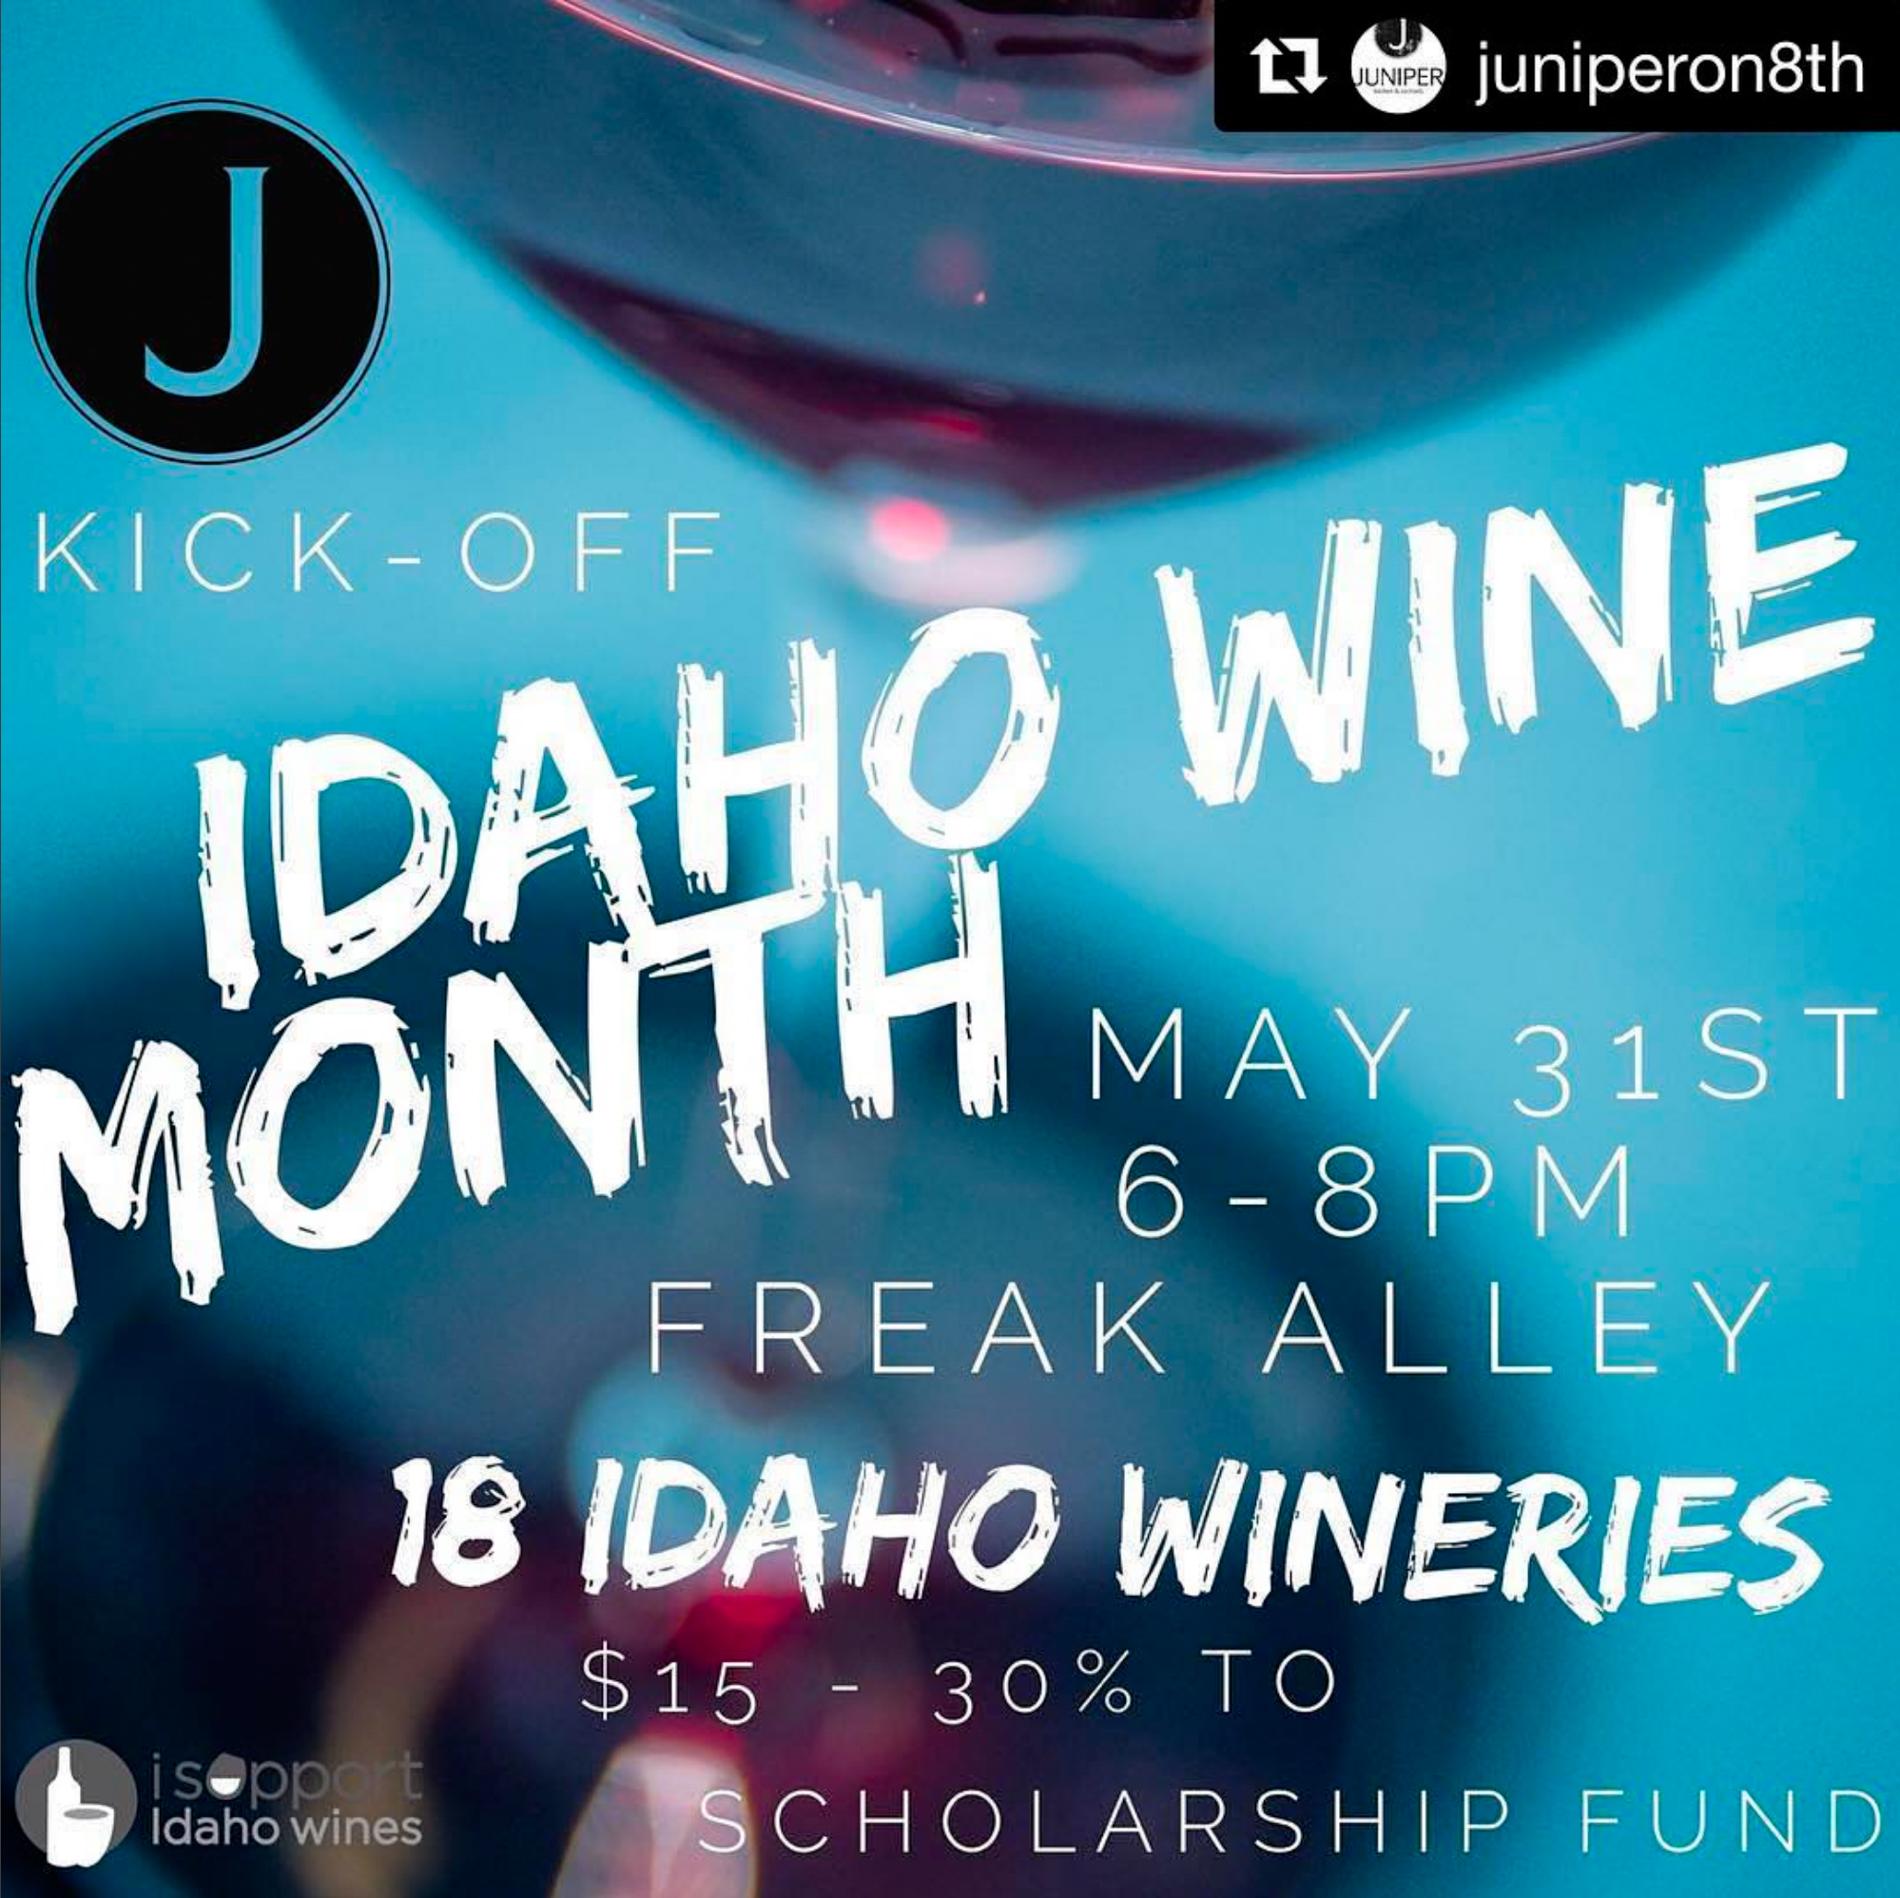 Idaho Wine Commission